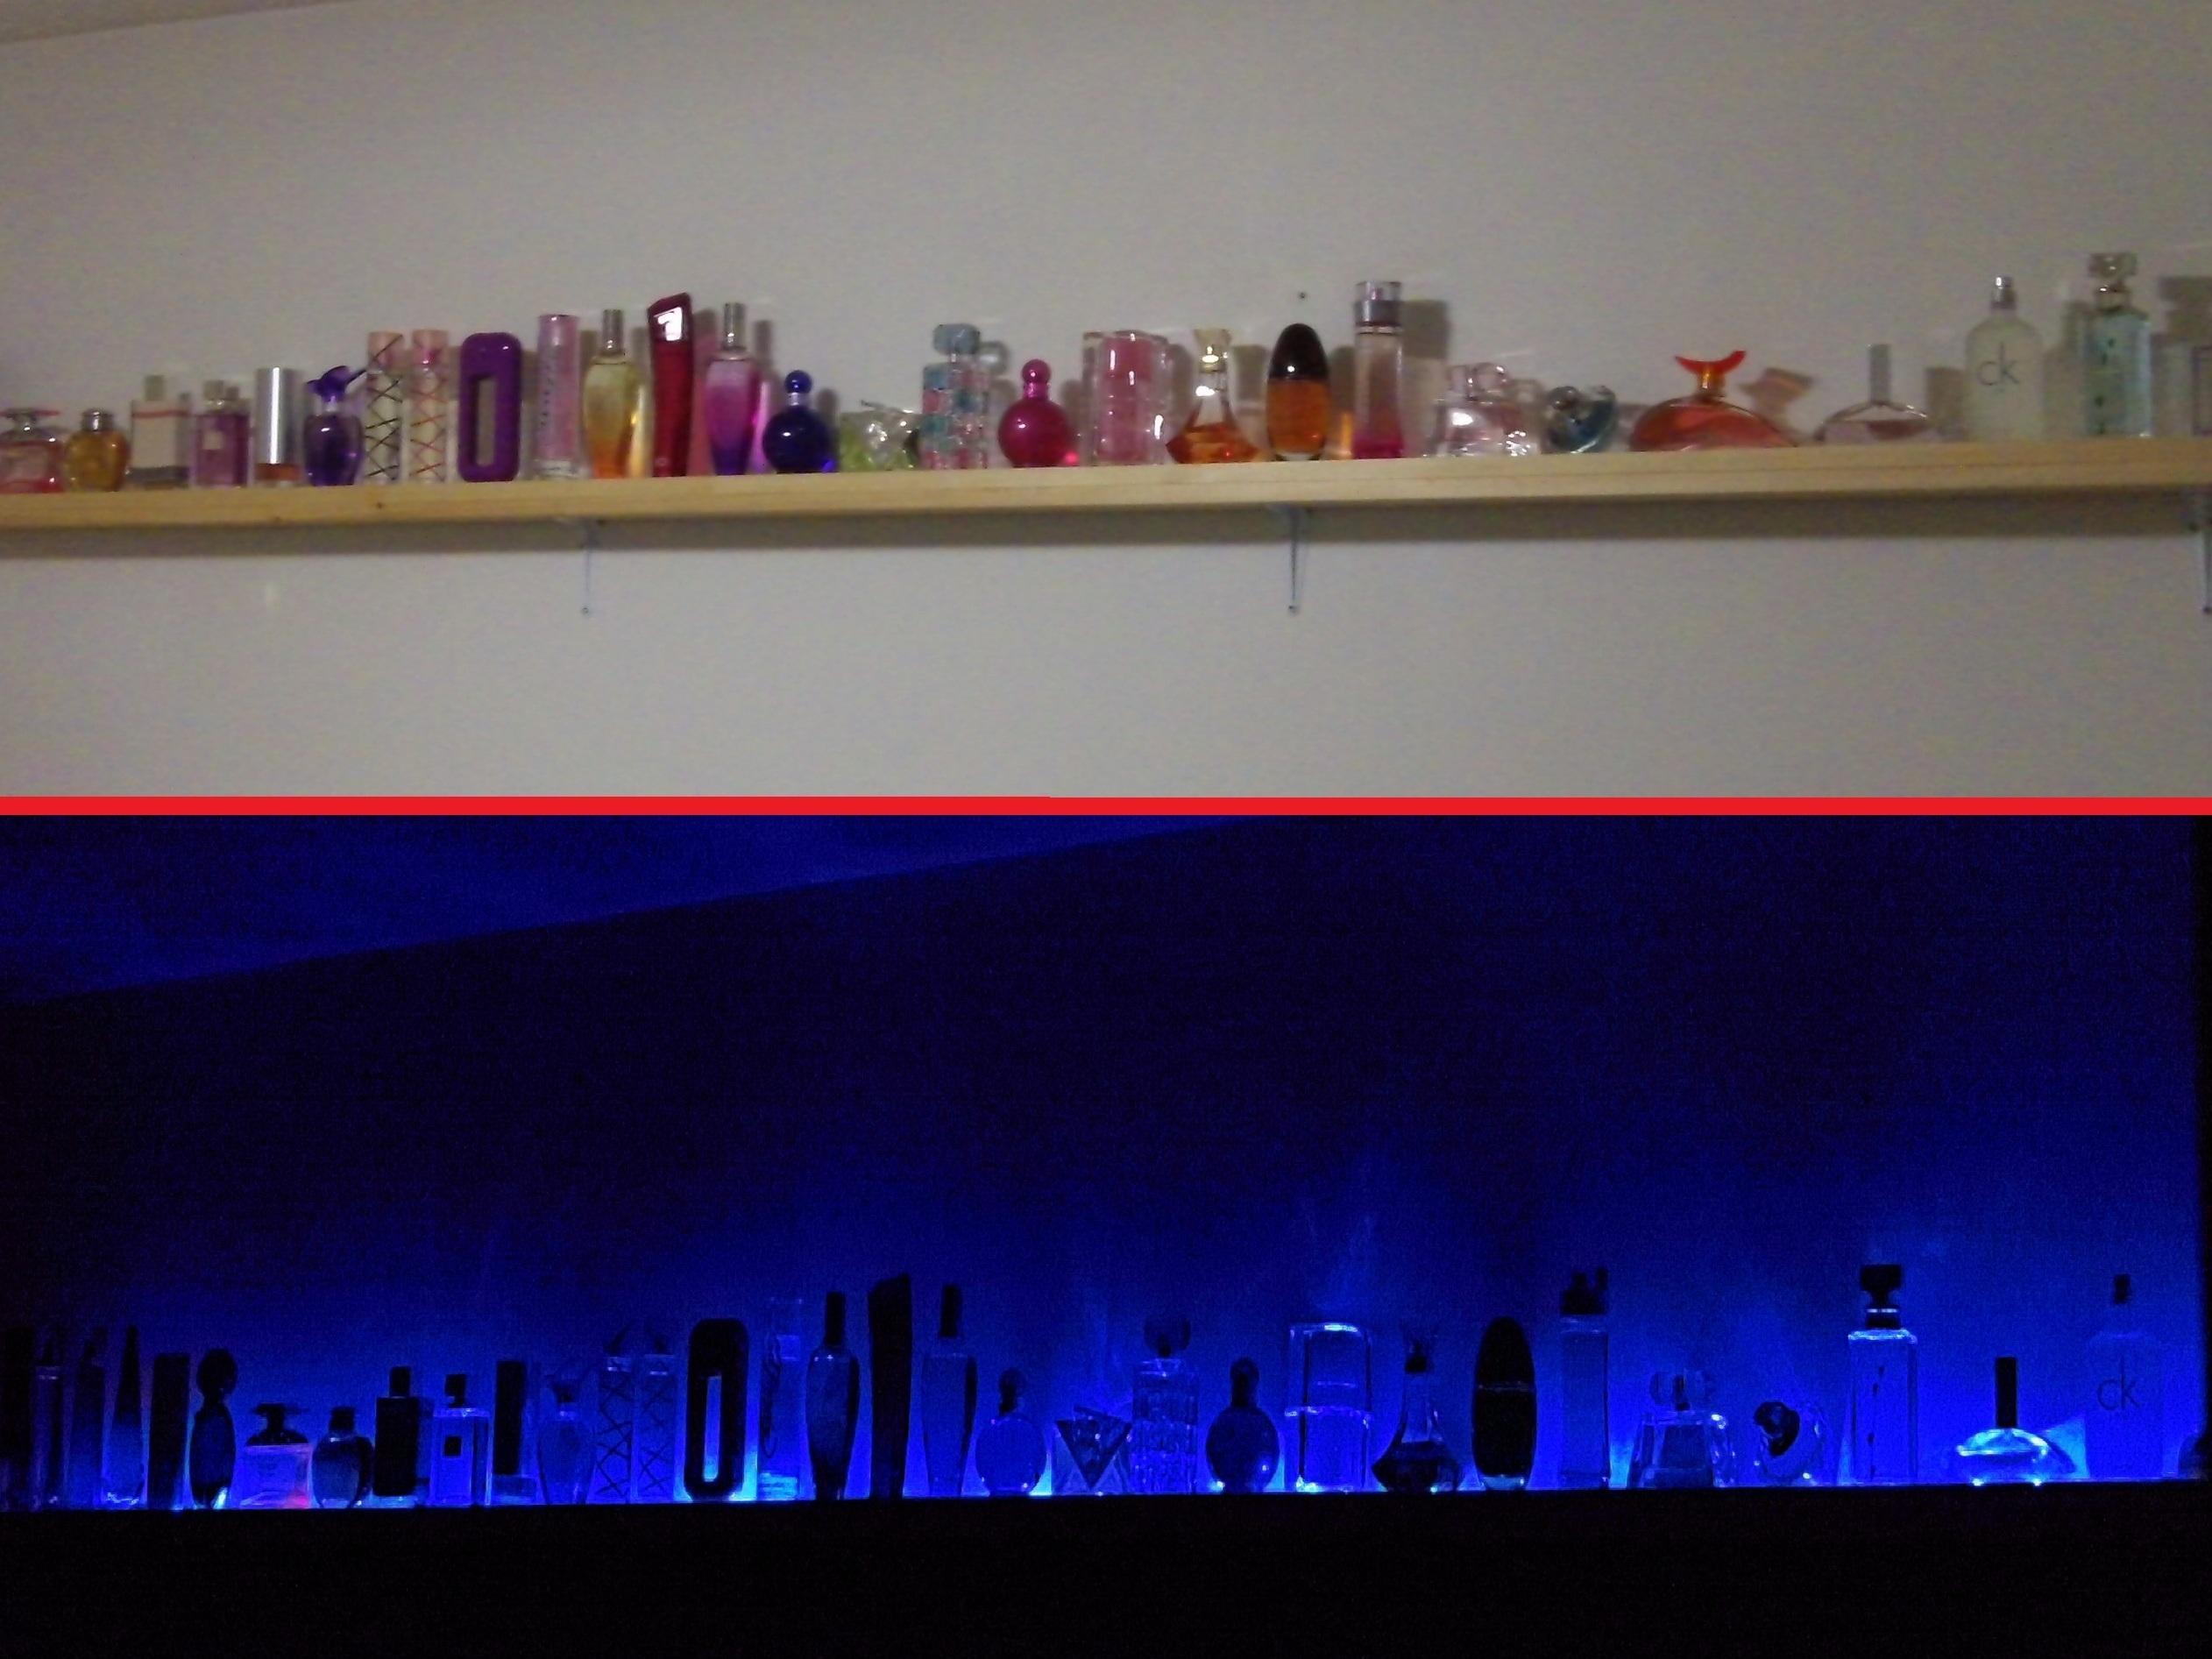 Lighted Shelf